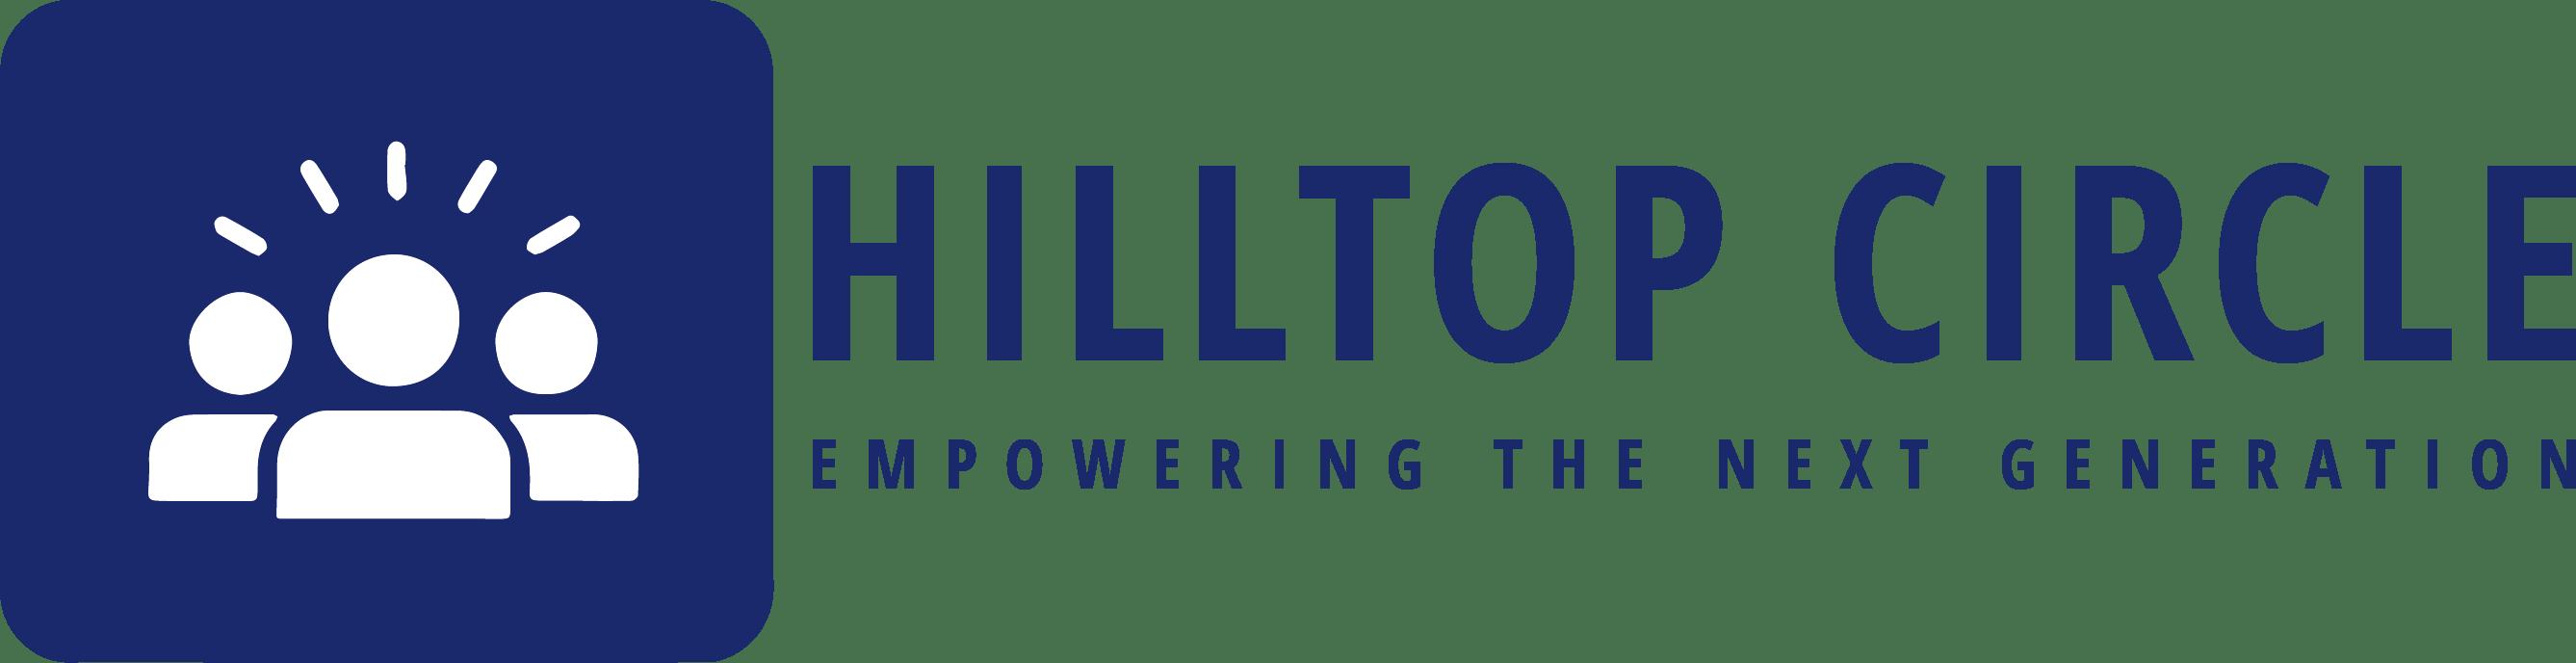 Hilltop Circle